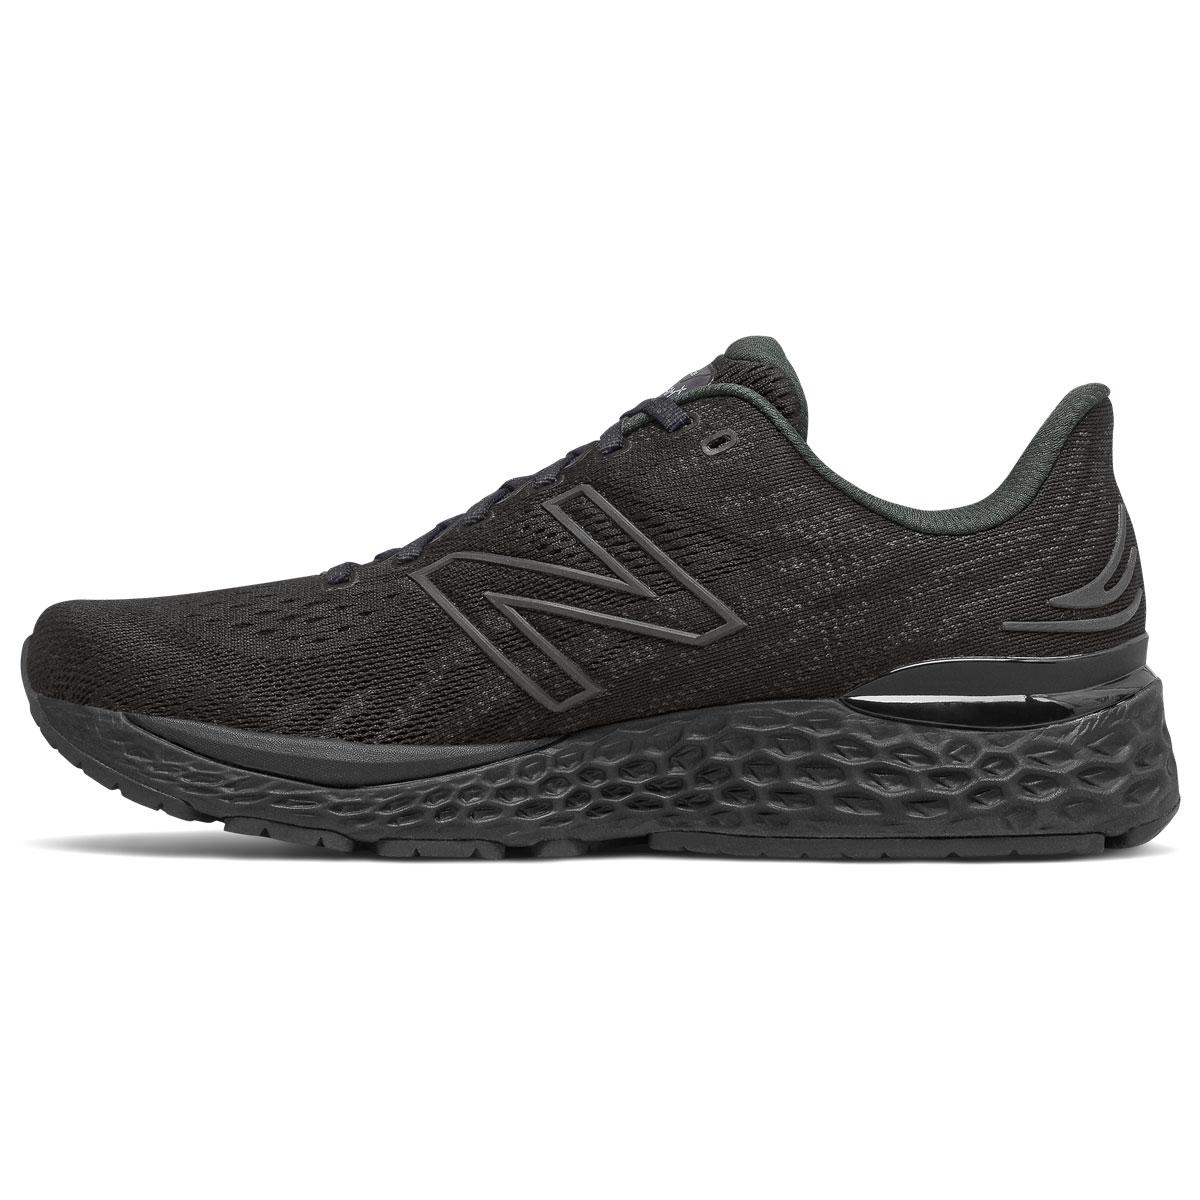 Men's New Balance Fresh Foam 880v11 Running Shoe - Color: Black/Phantom - Size: 6 - Width: Wide, Black/Phantom, large, image 2